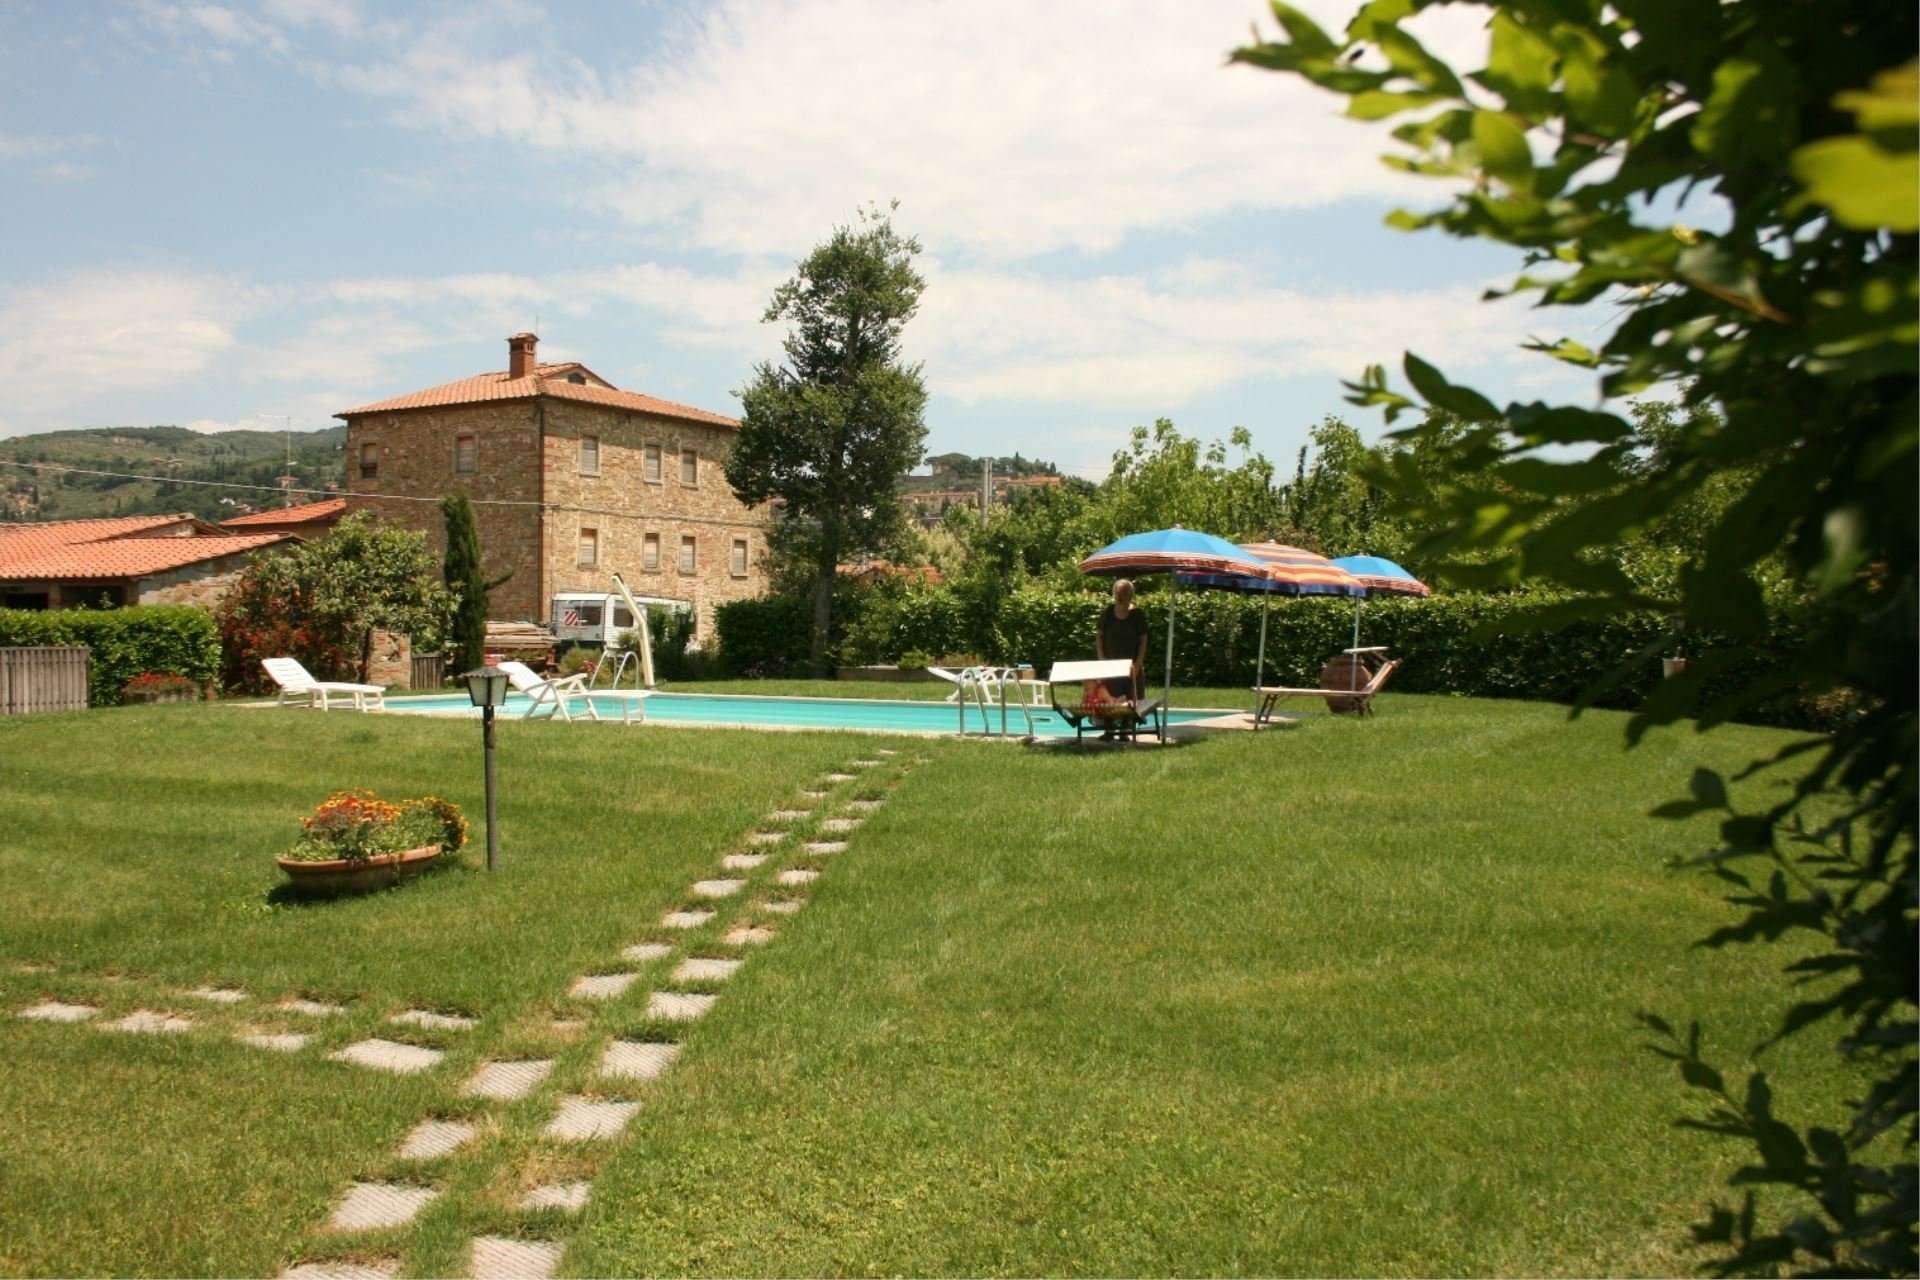 pozzonovo - tuin en zwembad